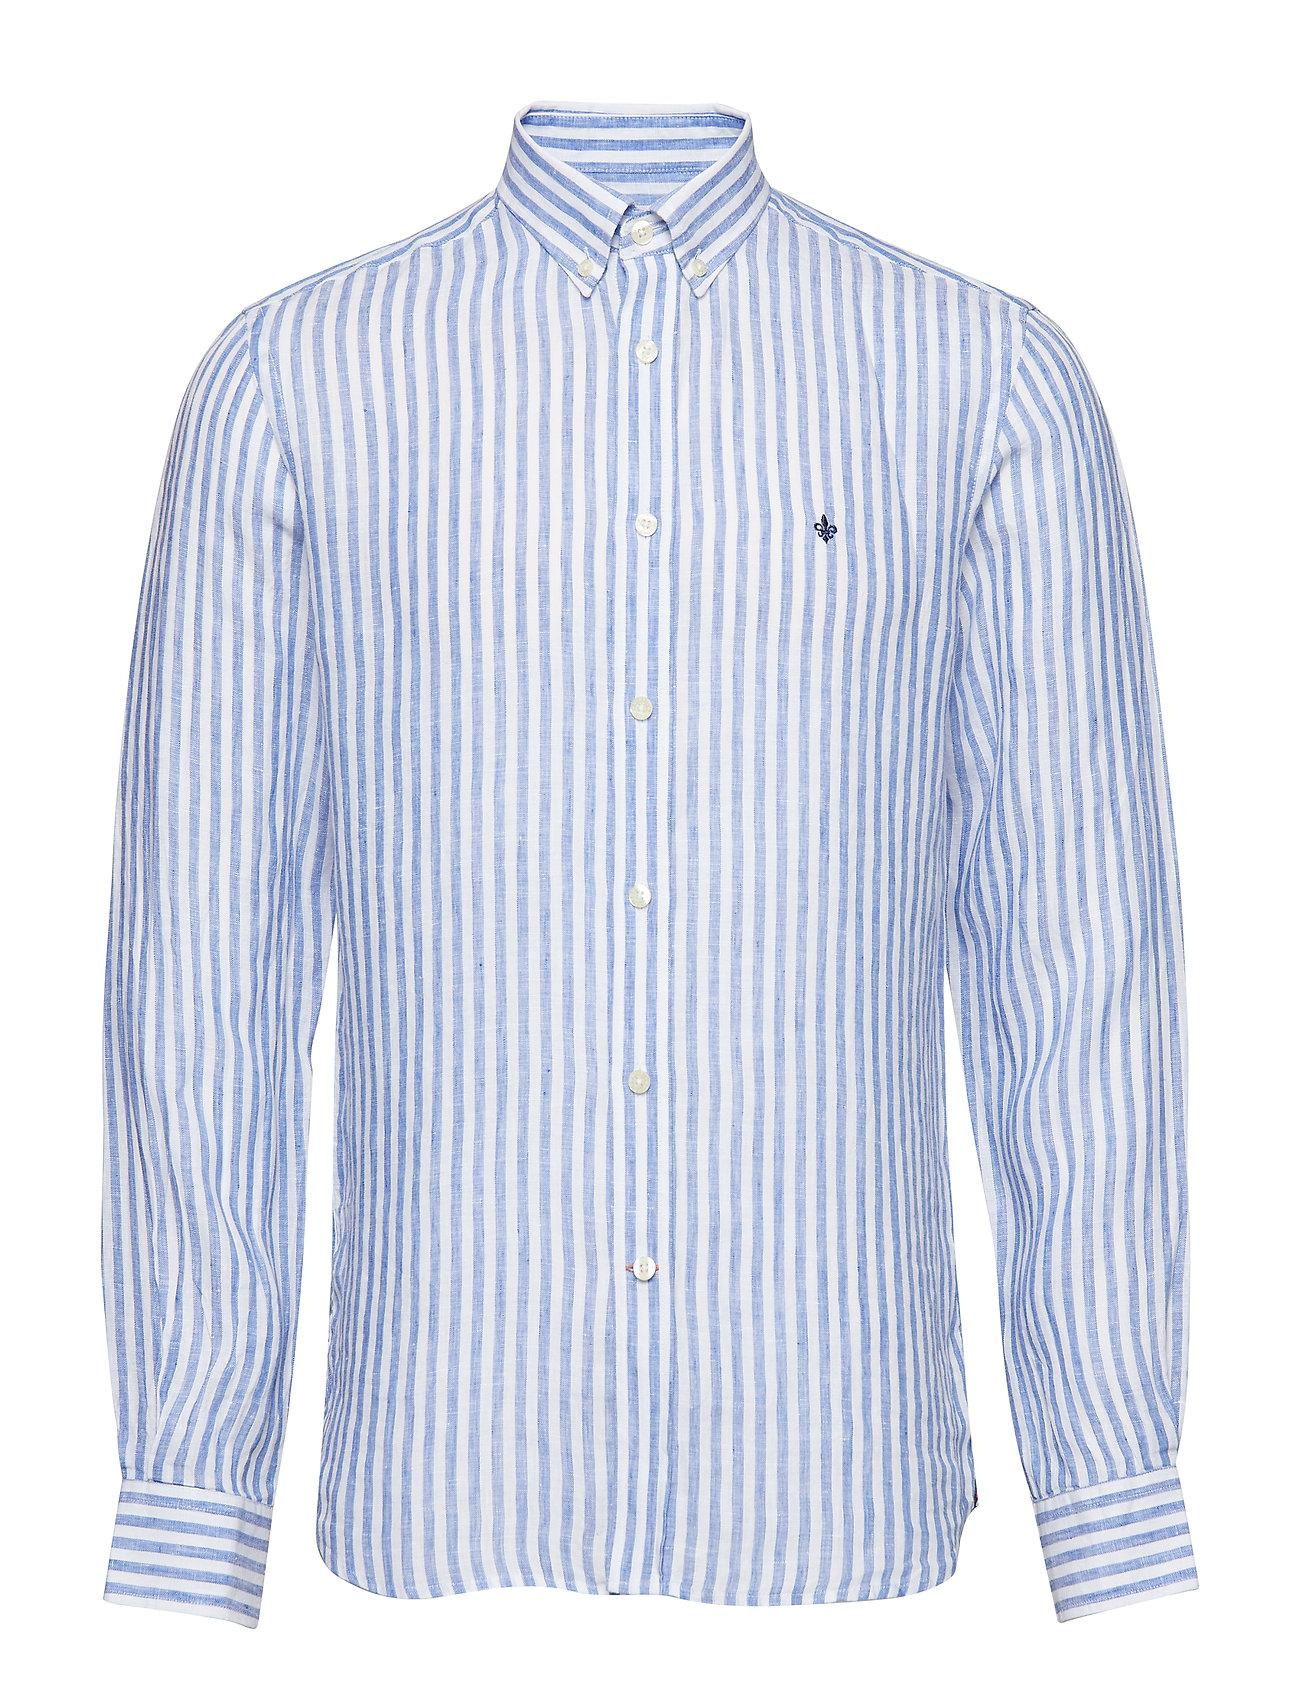 Morris Emanuel Button Down Shirt - BLUE